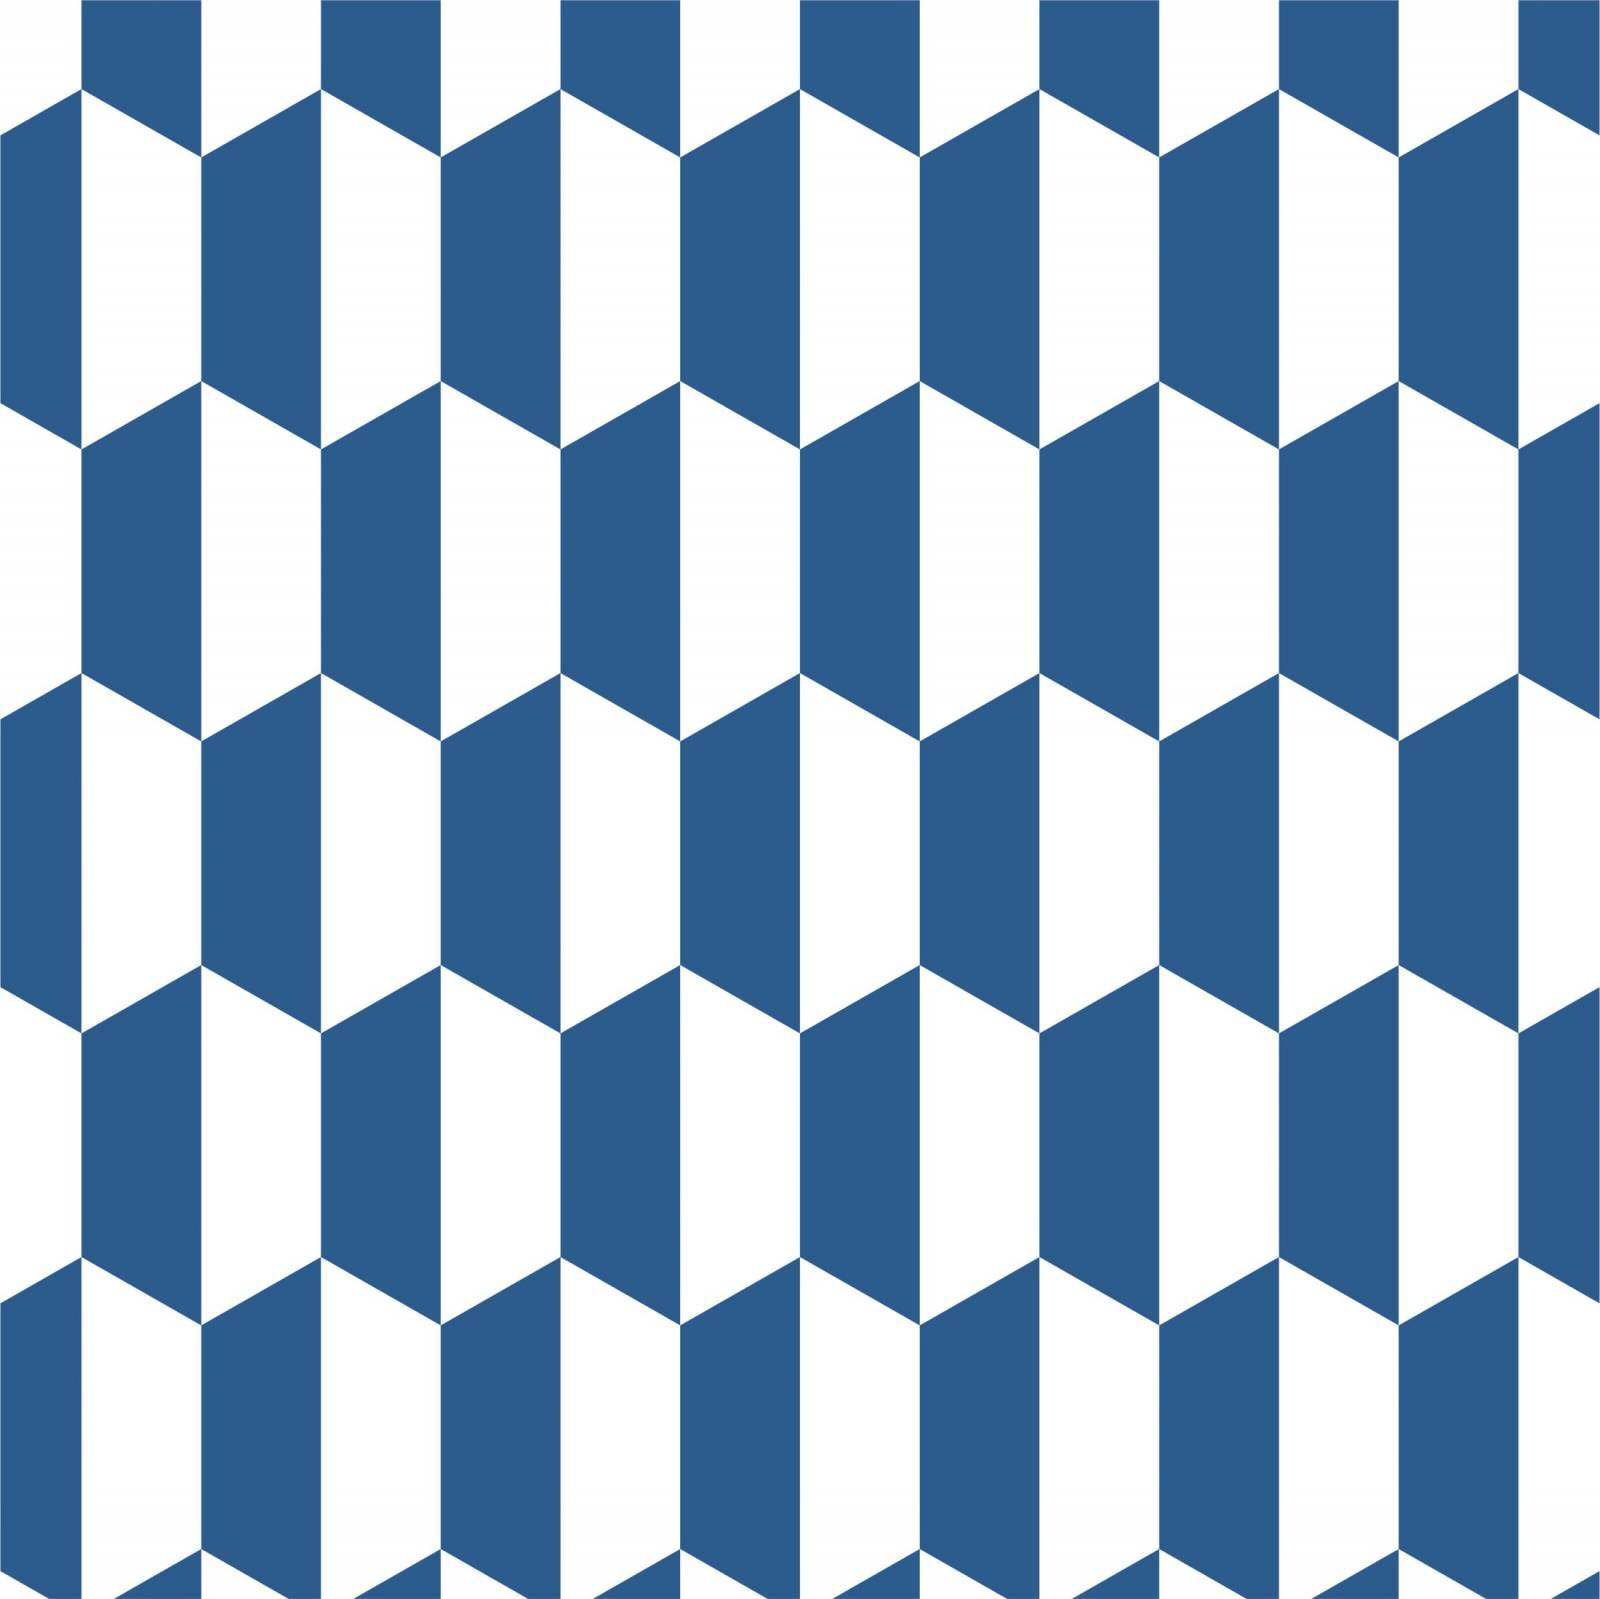 Papel de Parede Azul e Branco | Adesivo Vinilico imagem 1